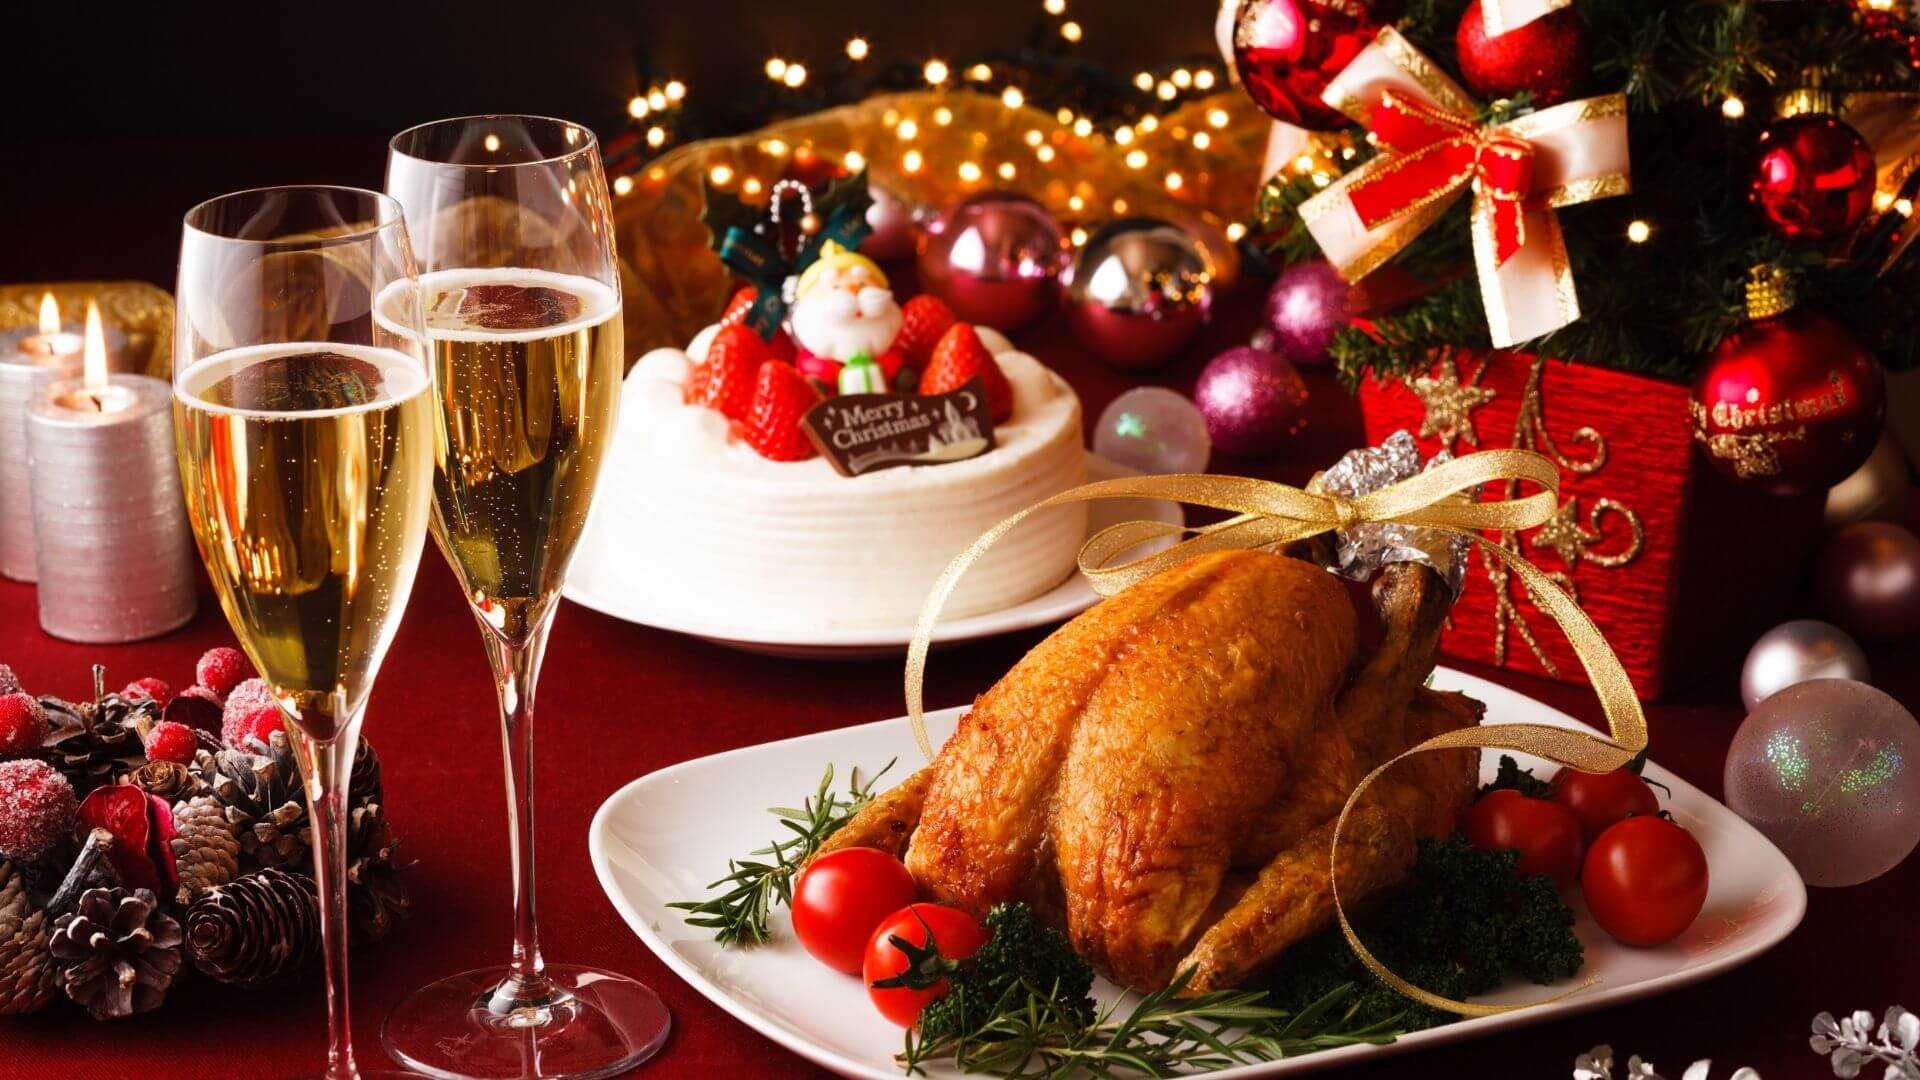 Elfordleigh Festive Dining